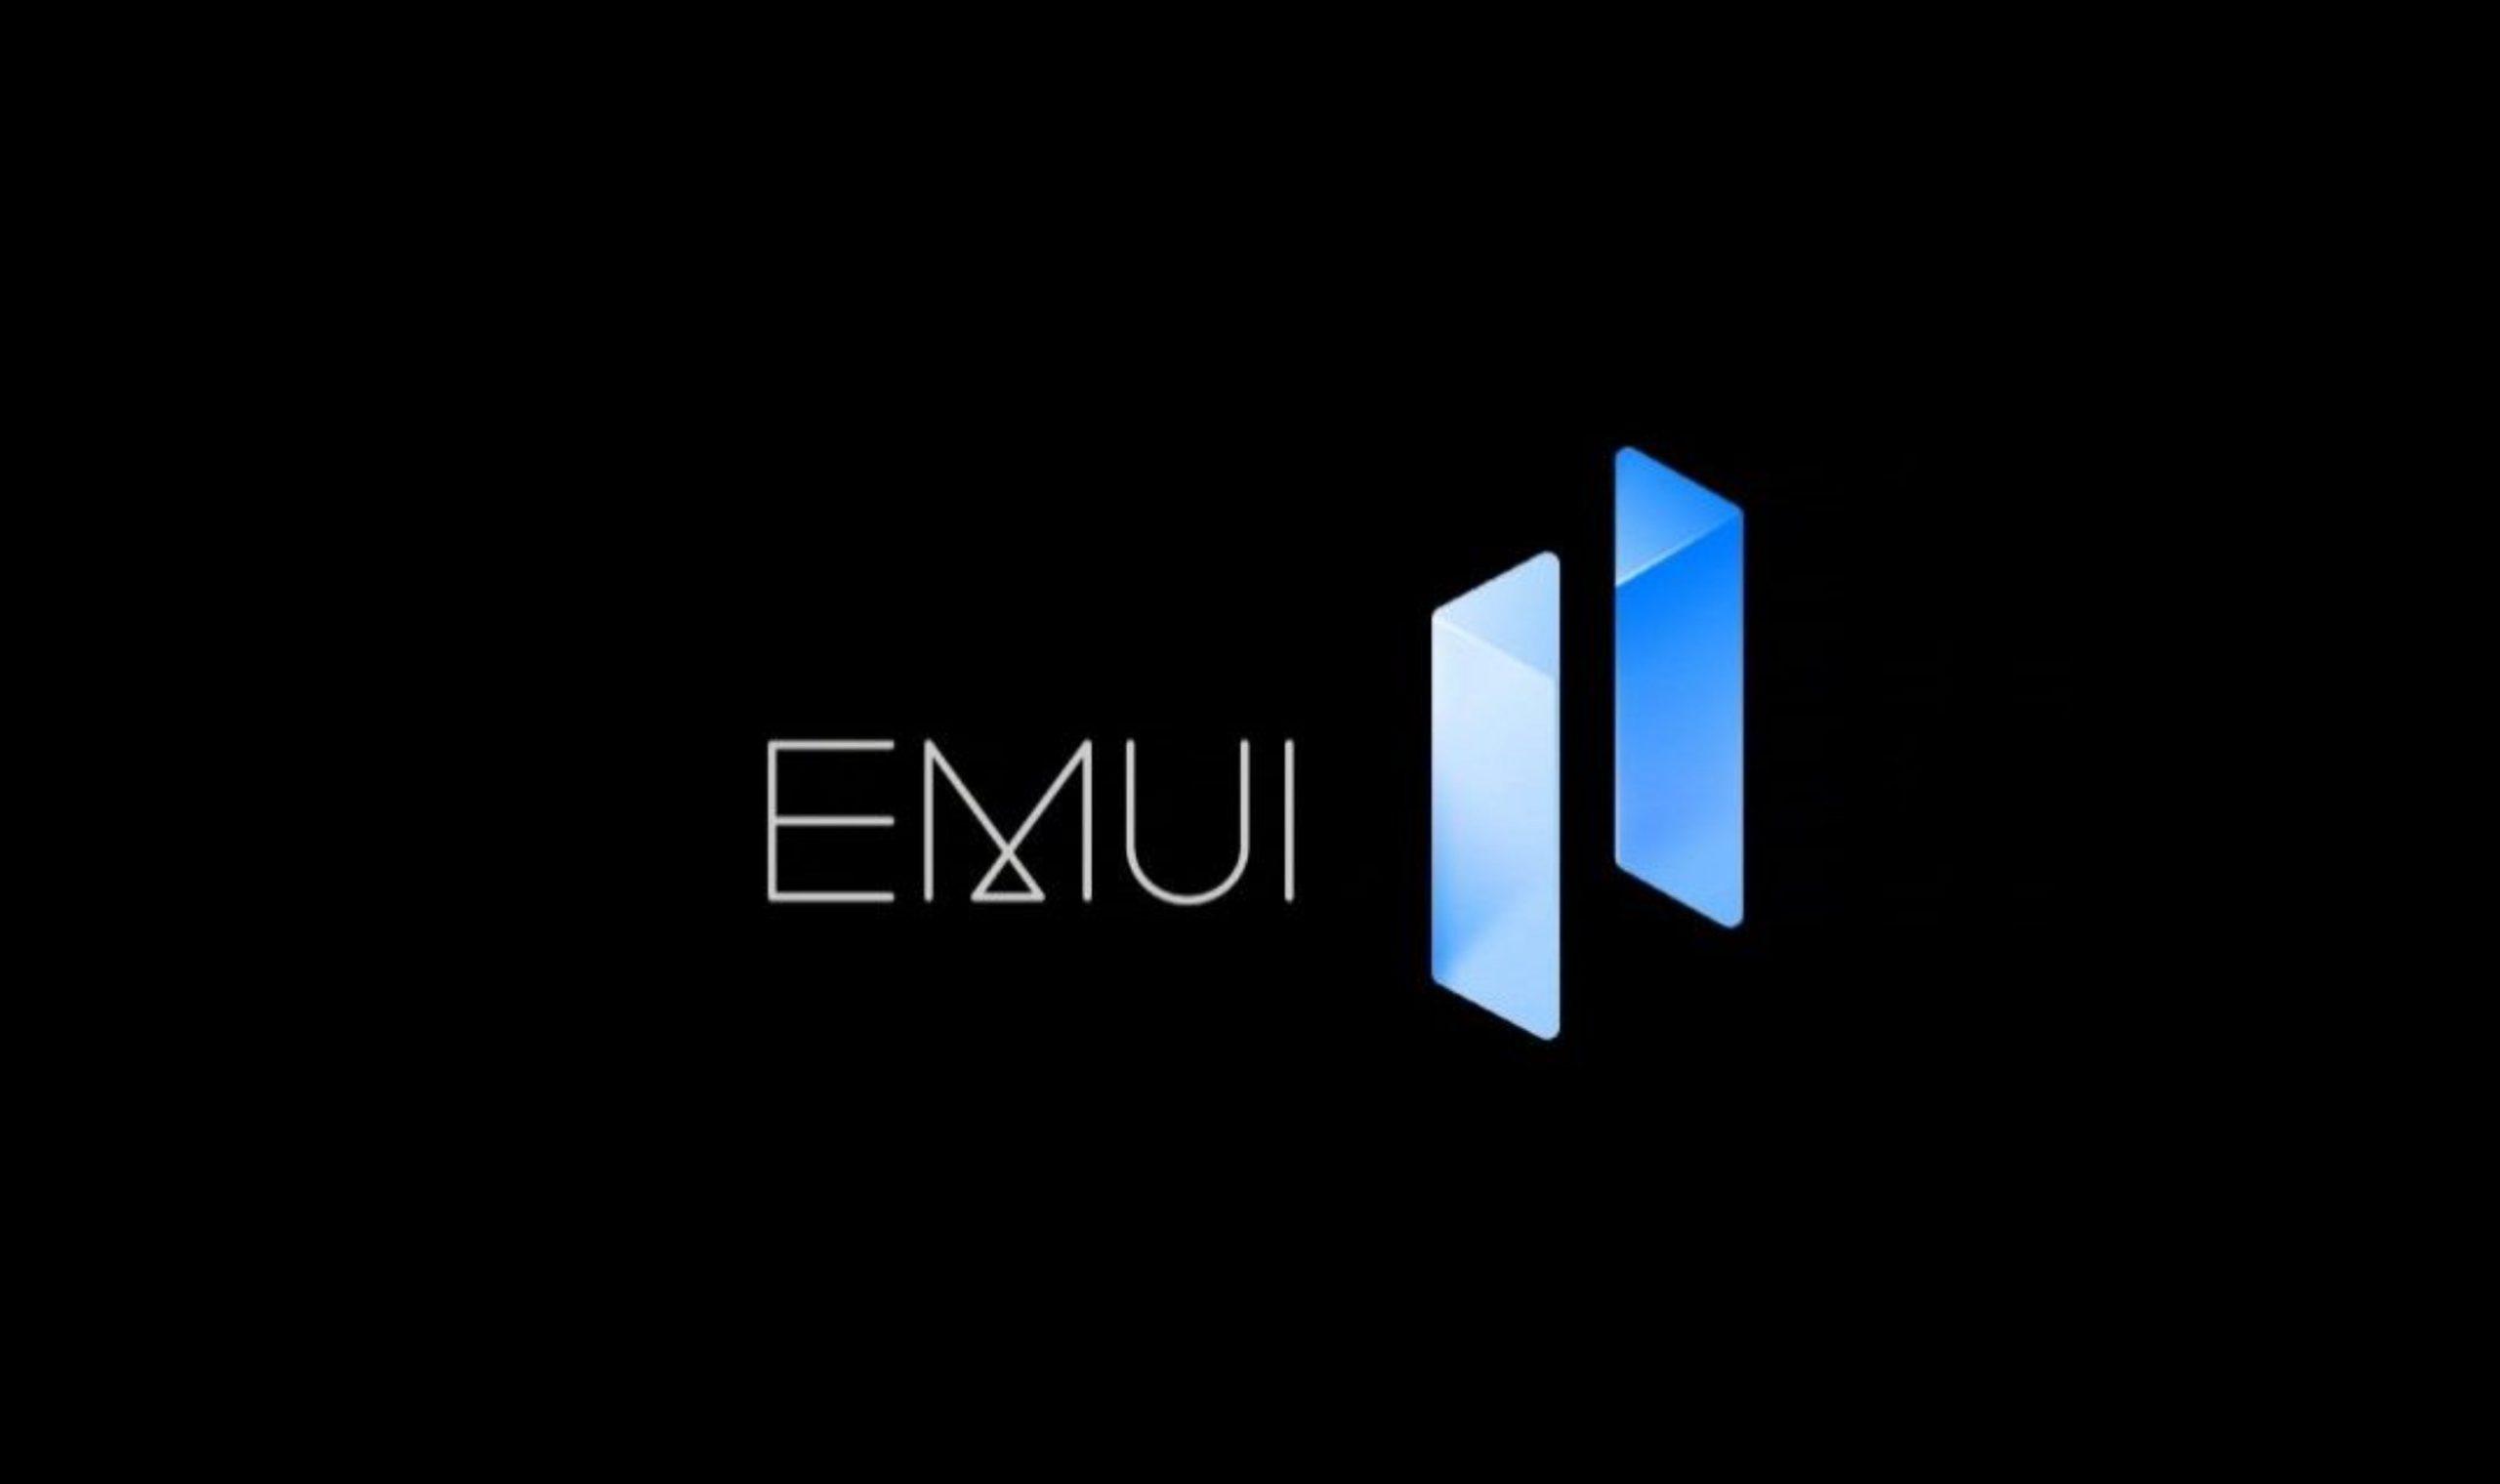 Huawei upgrades over 100 million users to EMUI 11, HarmonyOS the next stop